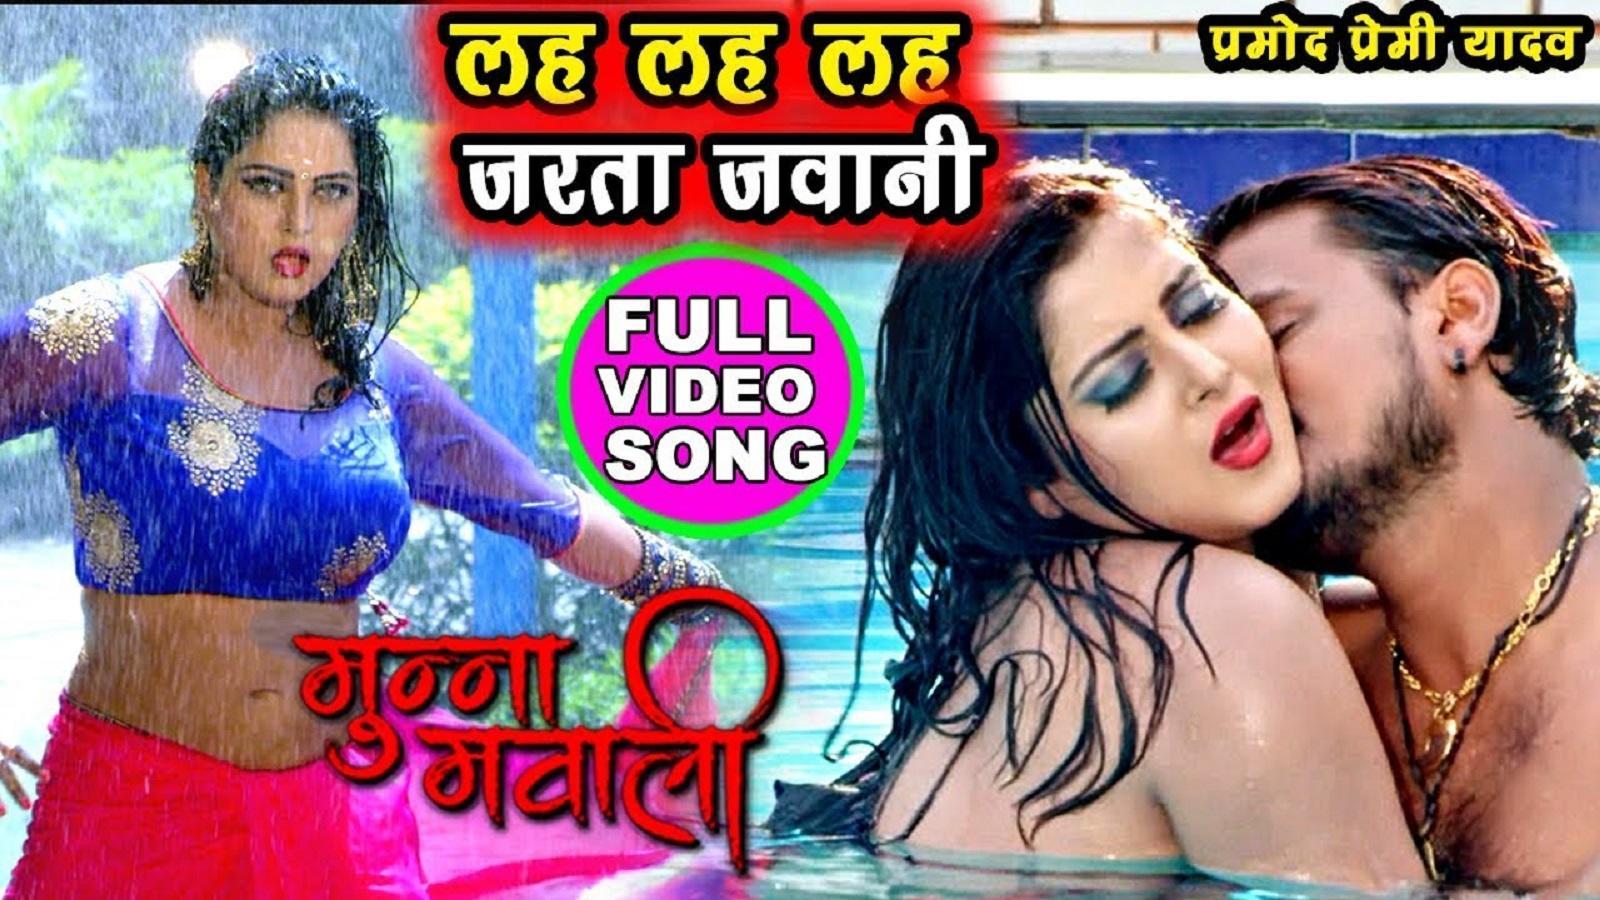 Watch: Bhojpuri song 'Lah Lah Lah Jarta Jawaani' from 'Munna Mawali' Ft   Pramod Premi Yadav and Anjana Singh